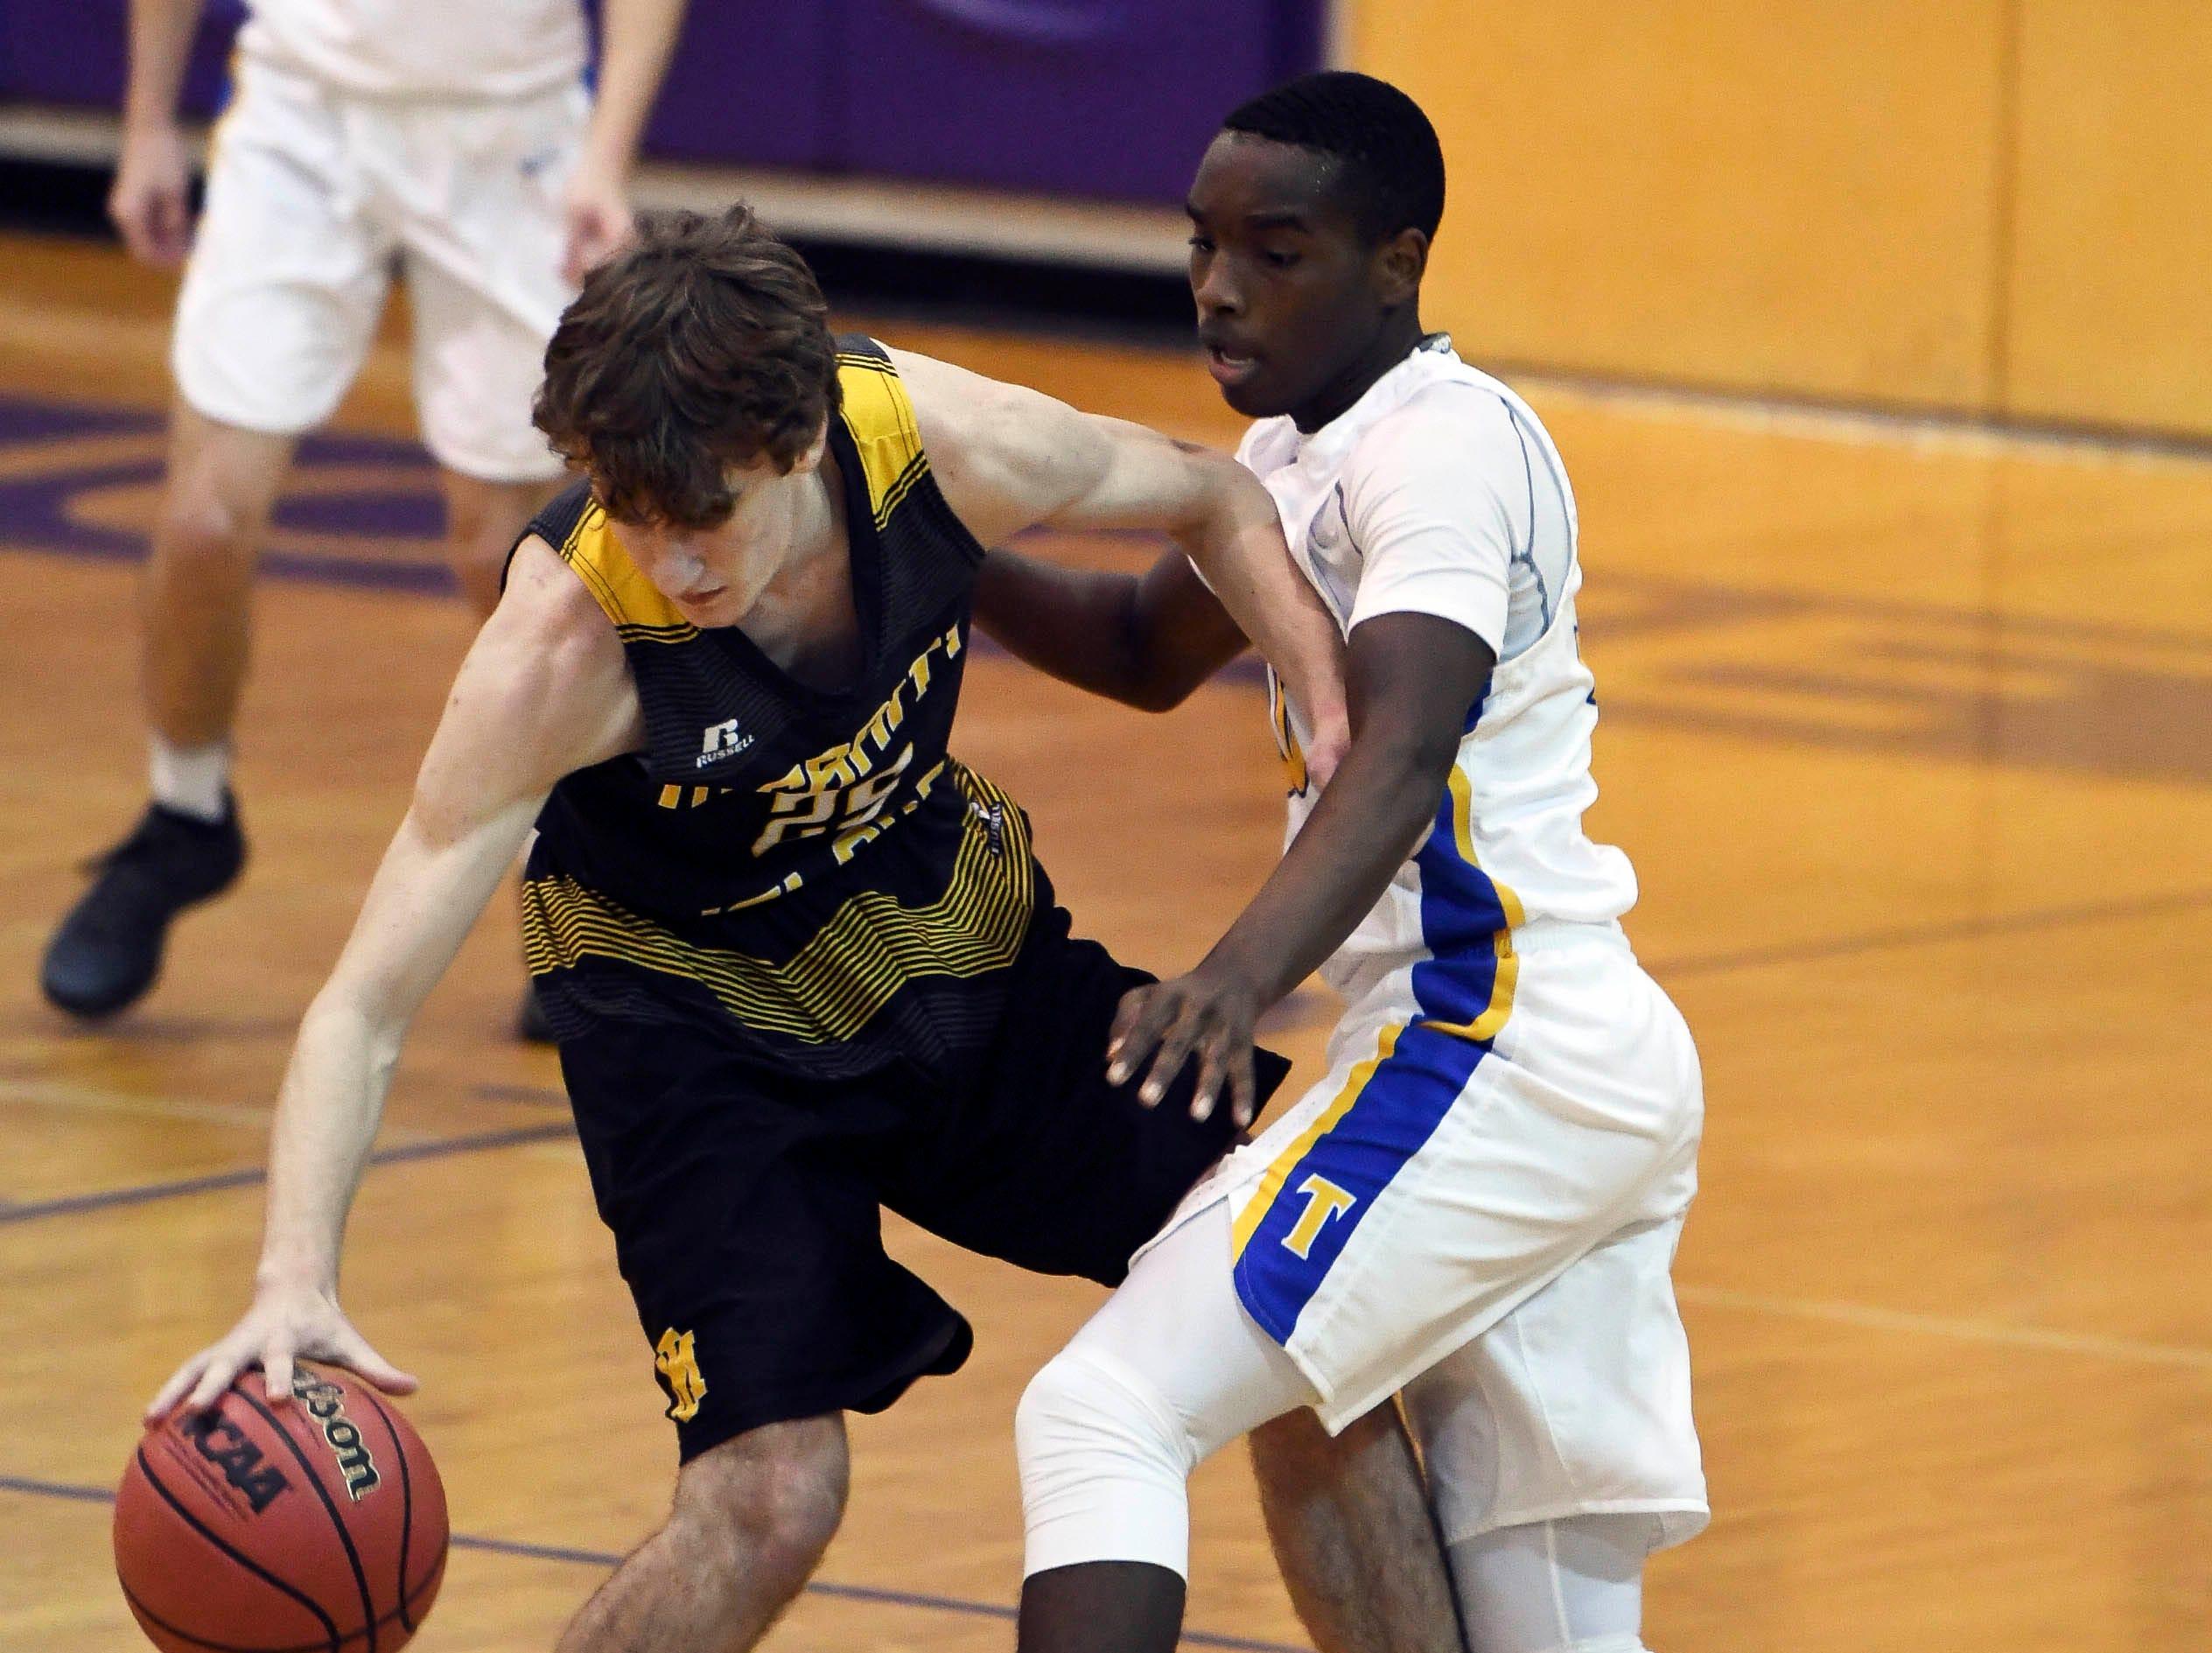 John Michael Zepp of Merritt Island keeps Keivn Brooks of Titusville from stealing the ball during Tuesday's District 14-6A boys basketball tournament